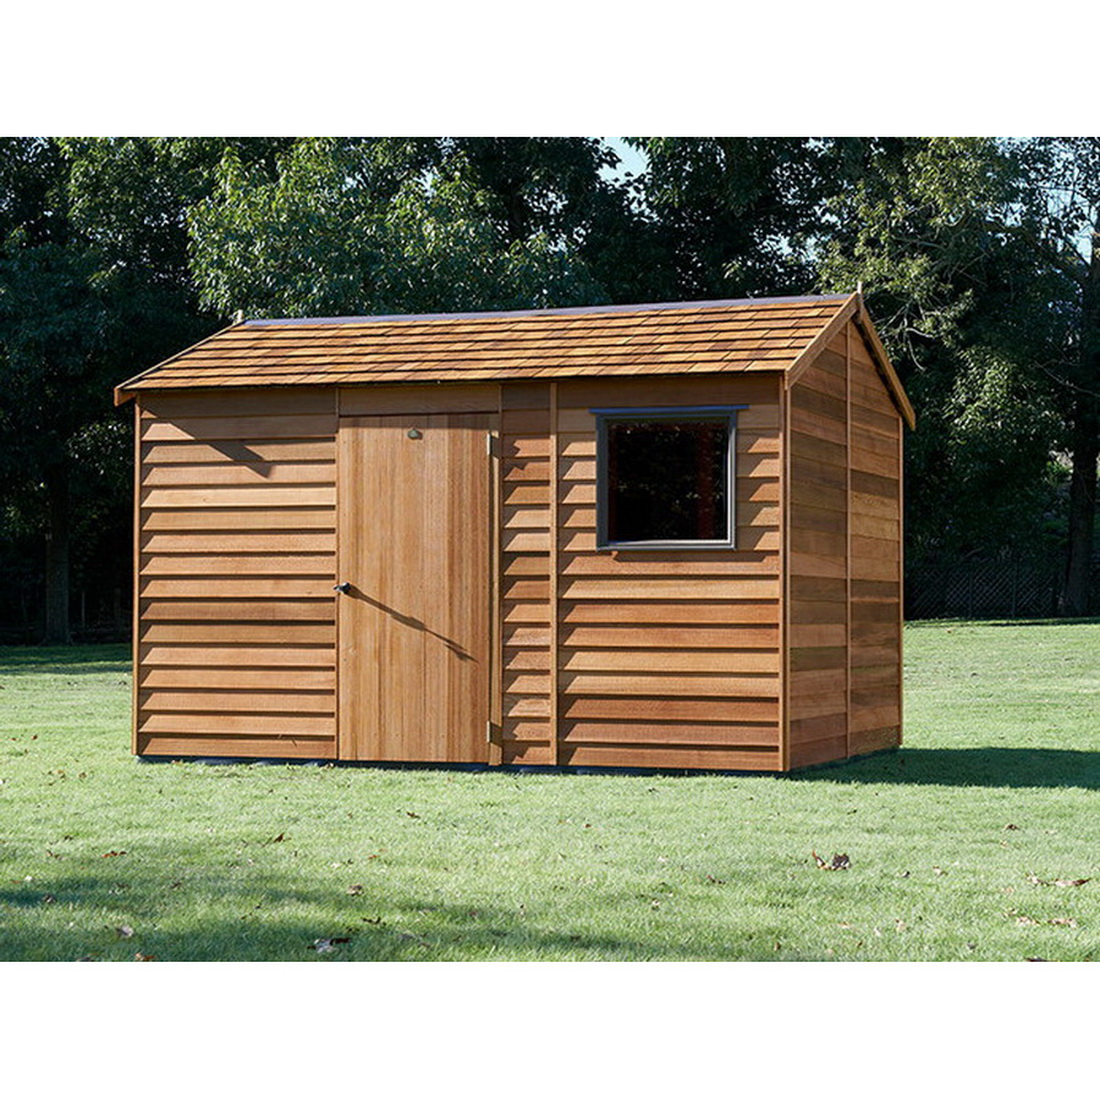 Bentley Shinglel Roof Kitset Garden Timber Shed 3.6 x 2.5 x 2.46 m Natural CBS